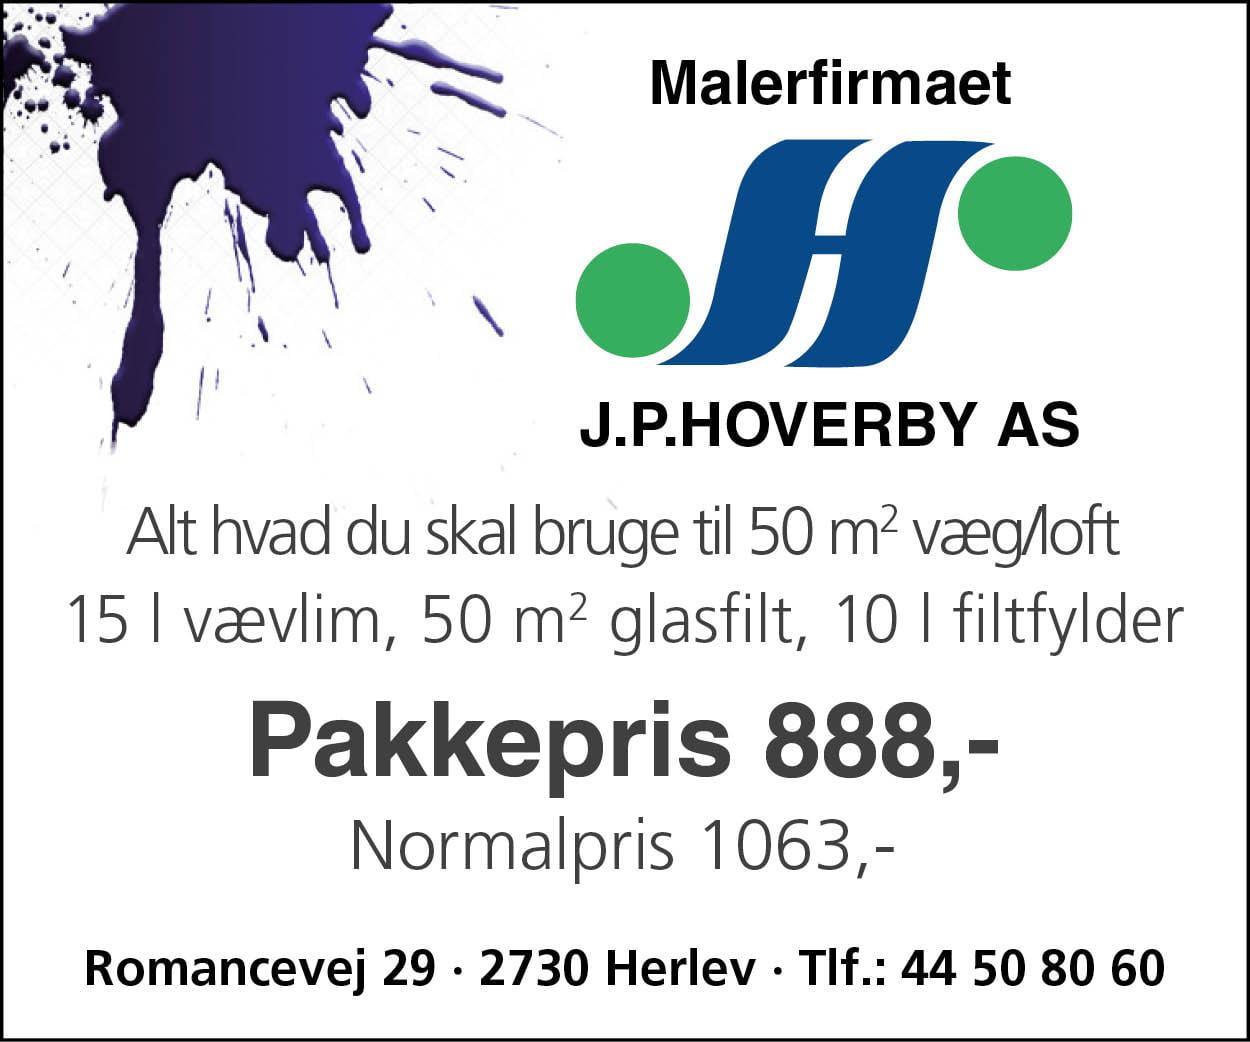 300 x 250 Hoverby undersidebanner